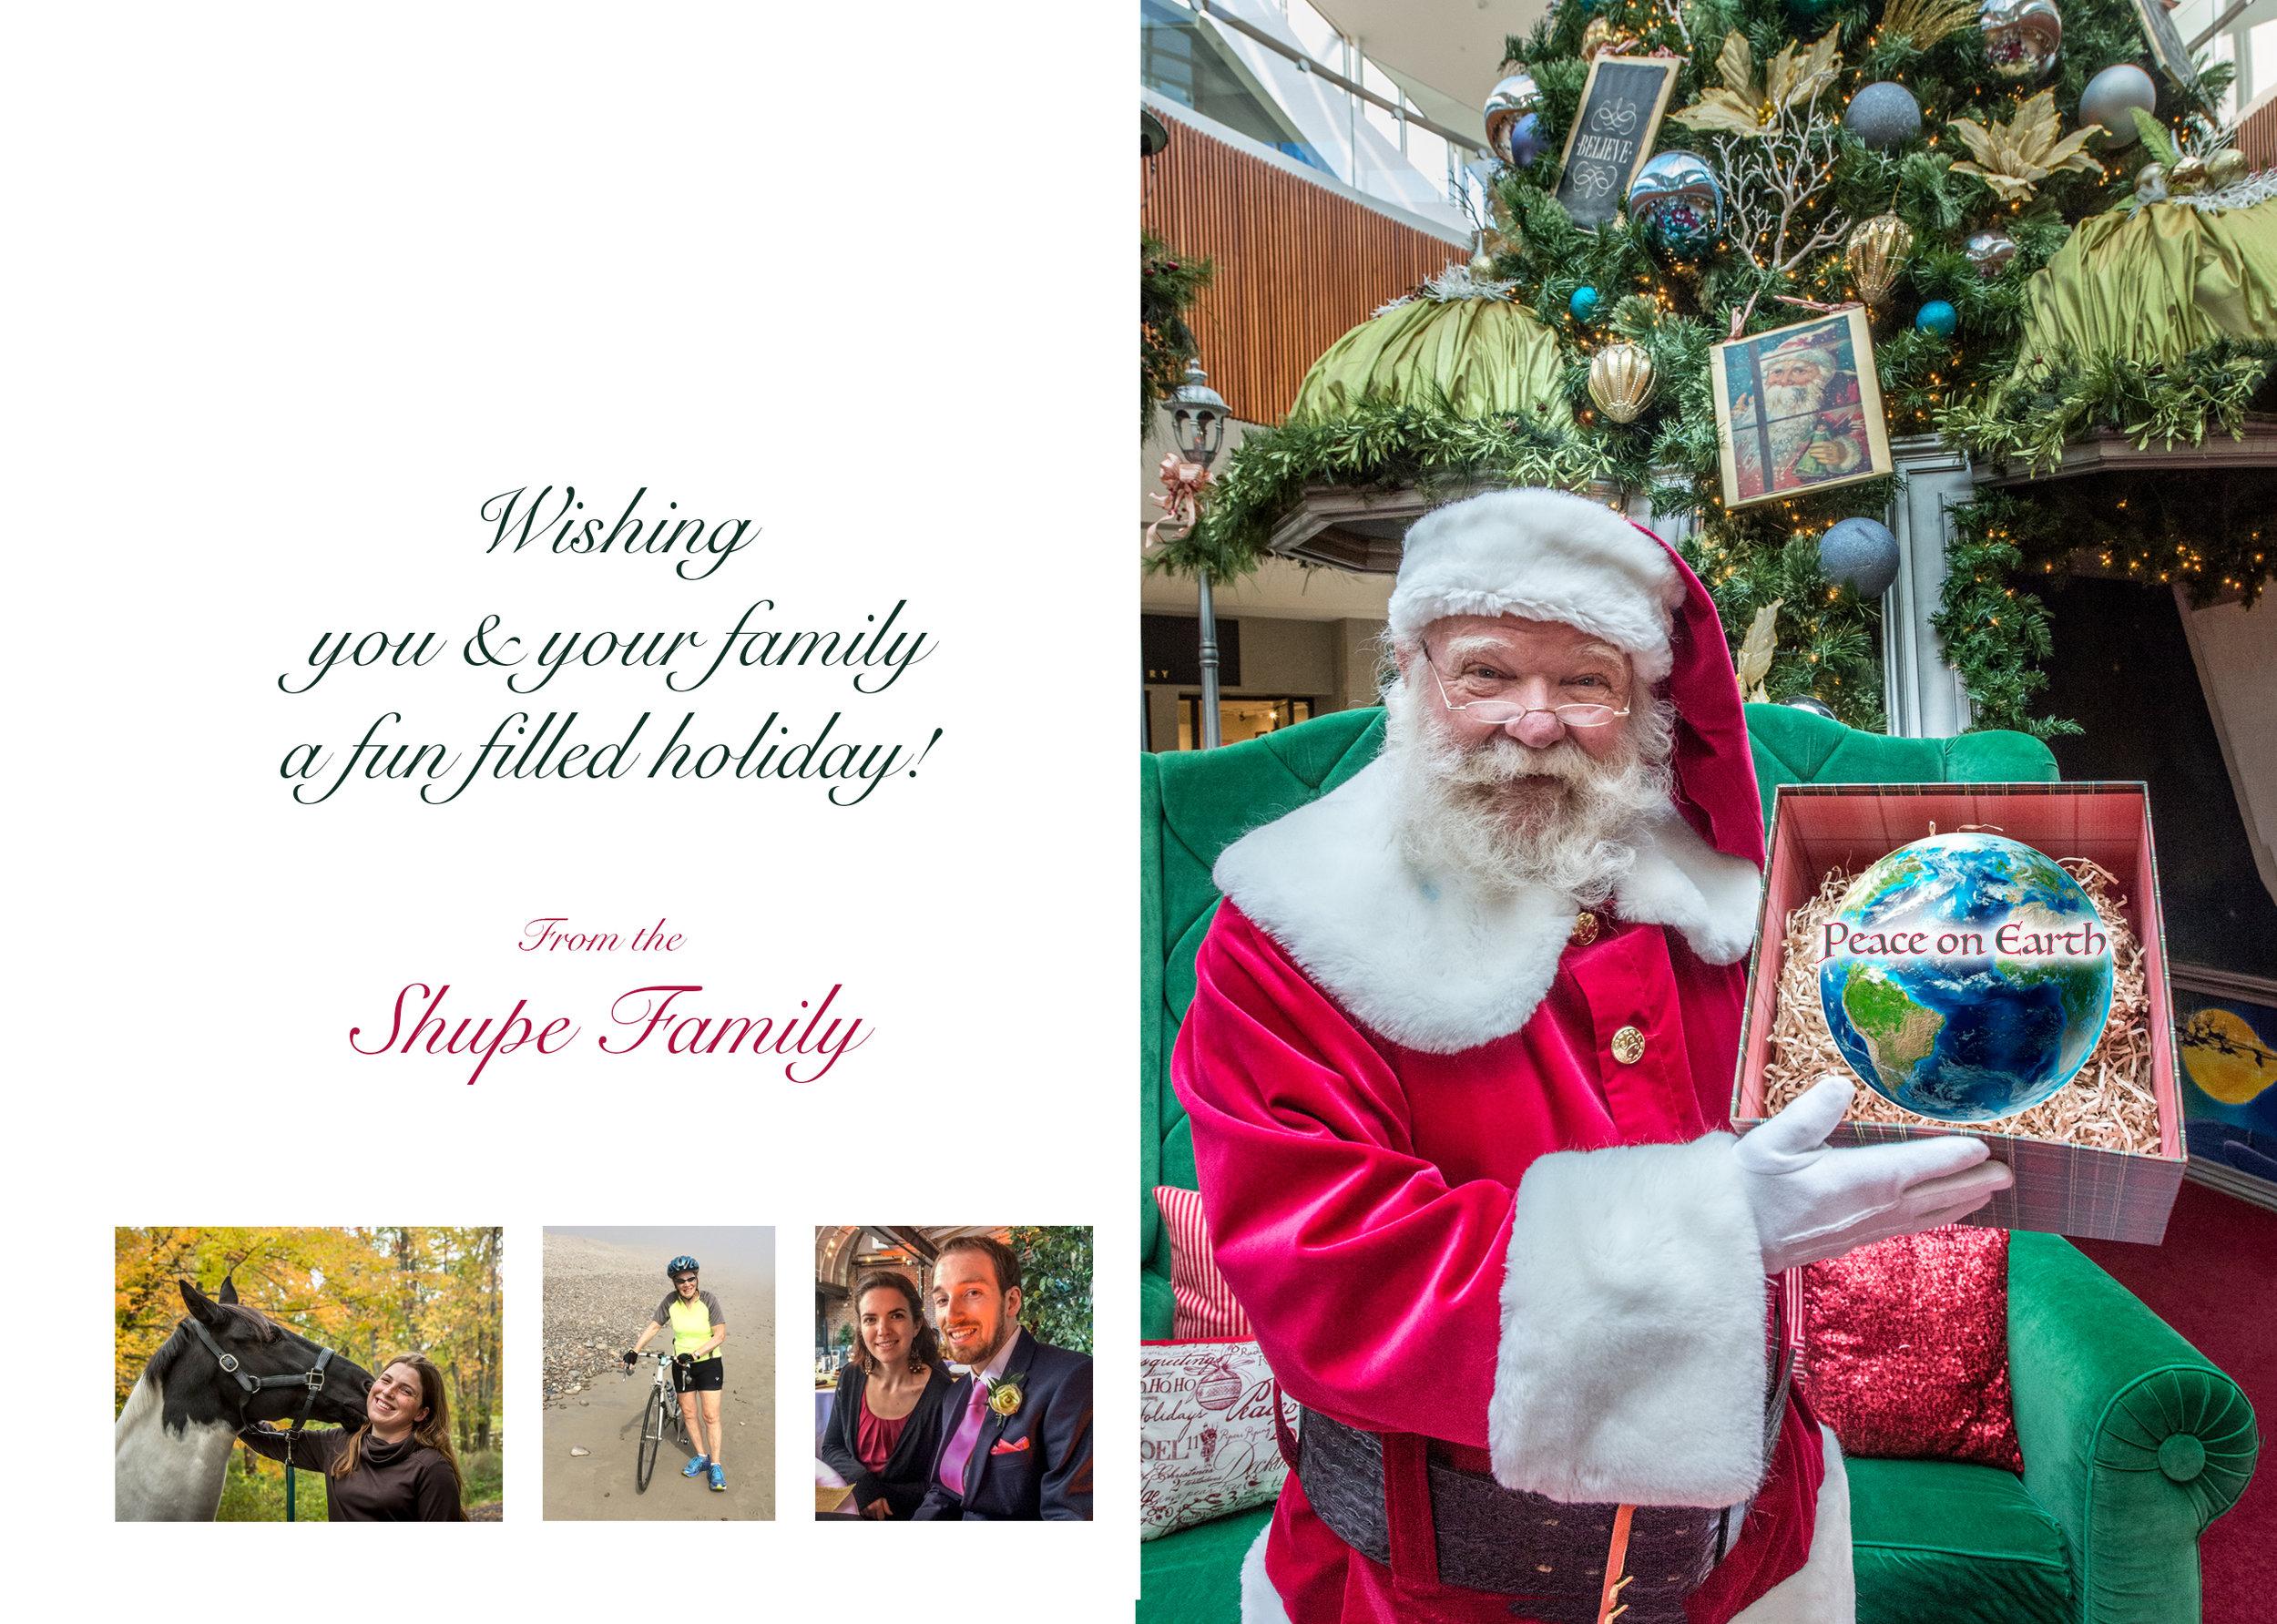 ShupeStudios_Final_2017_Holiday_Card-inside.jpg